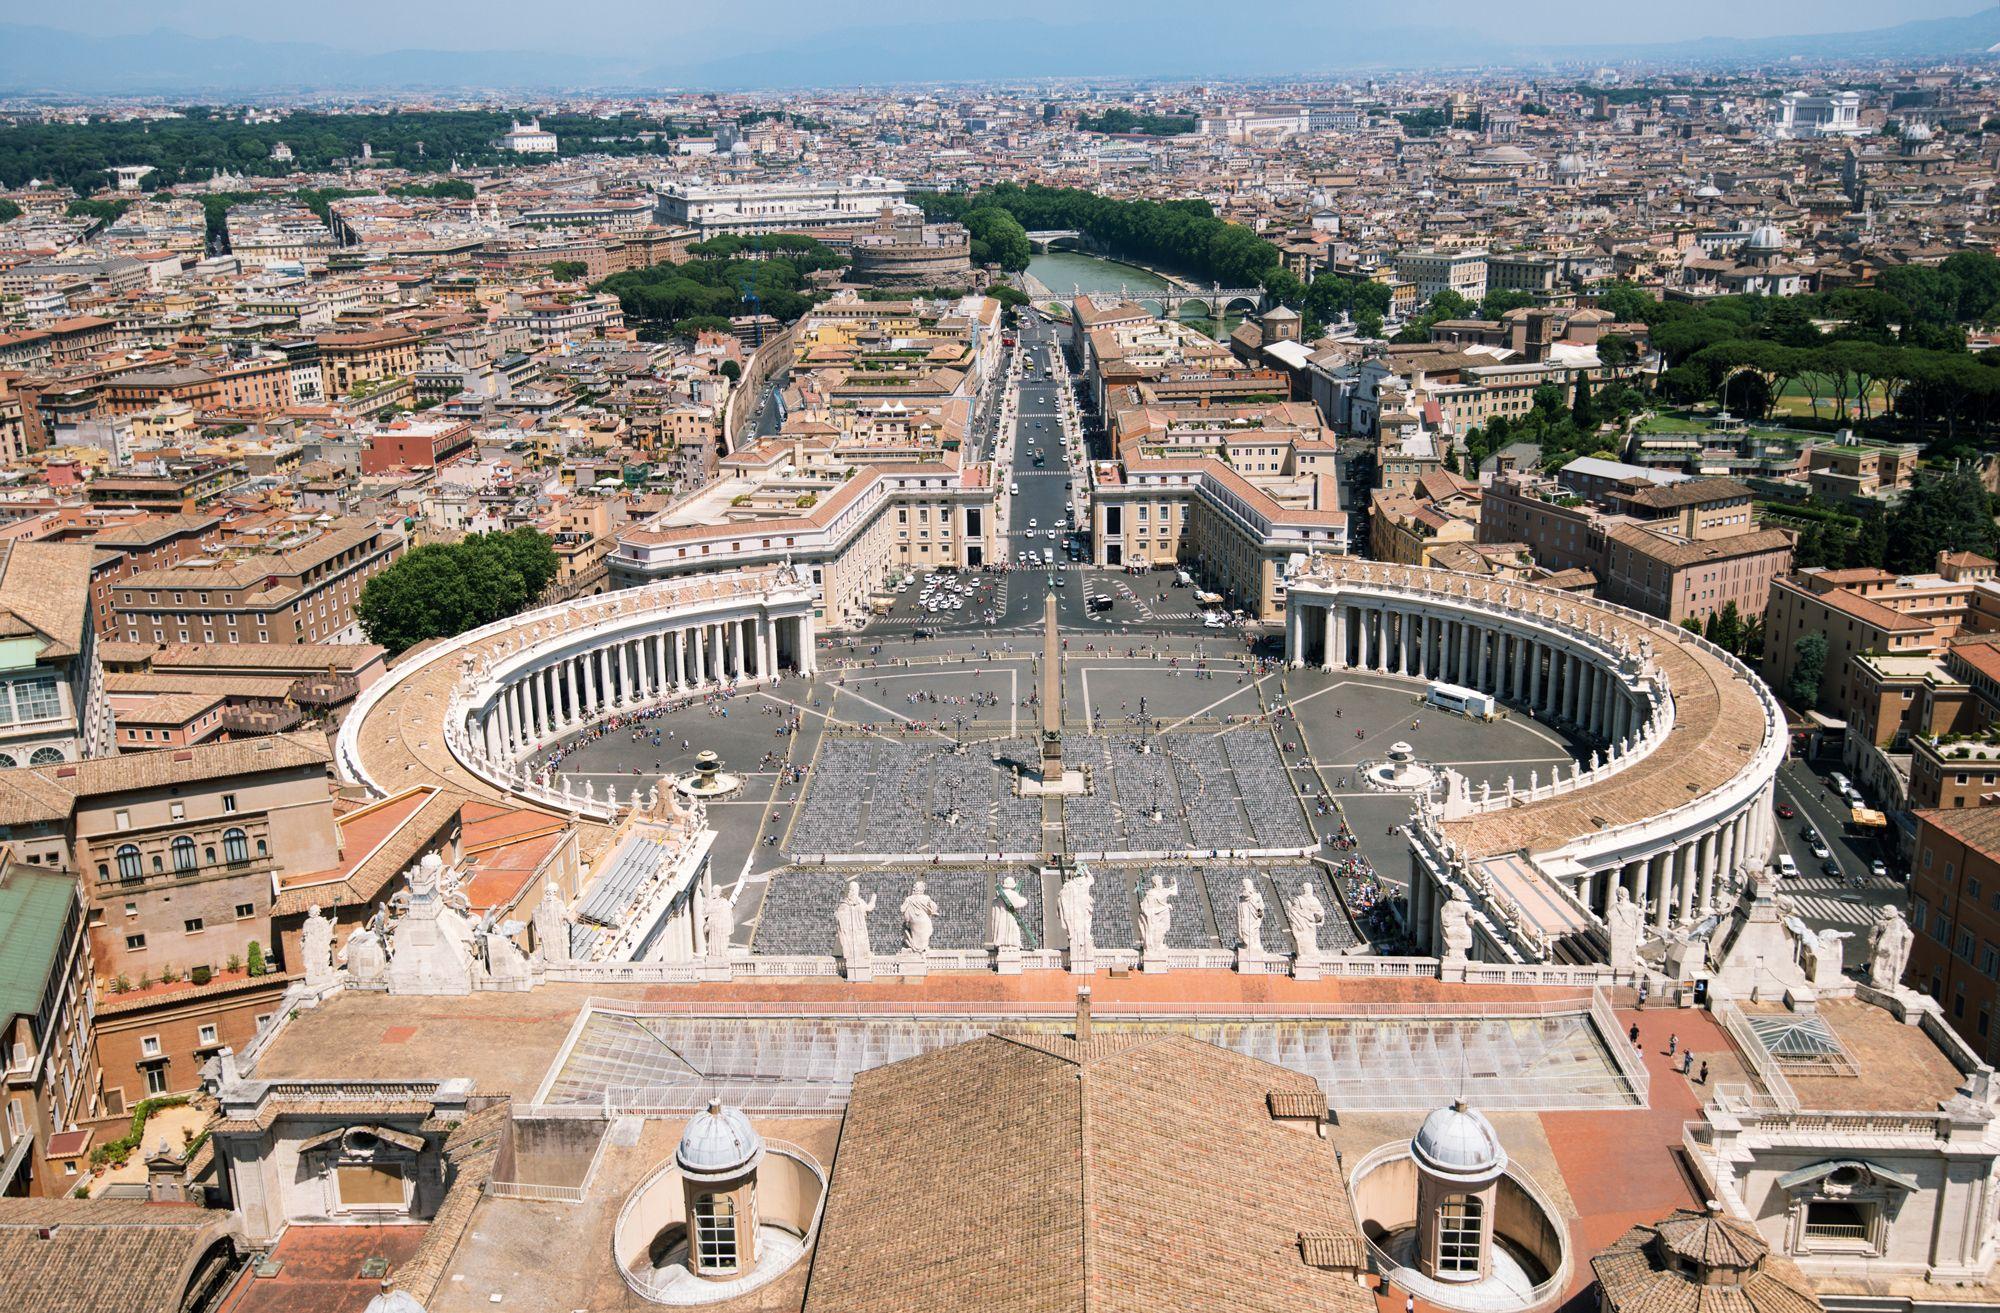 Площадь Святого Петра в Ватикане.